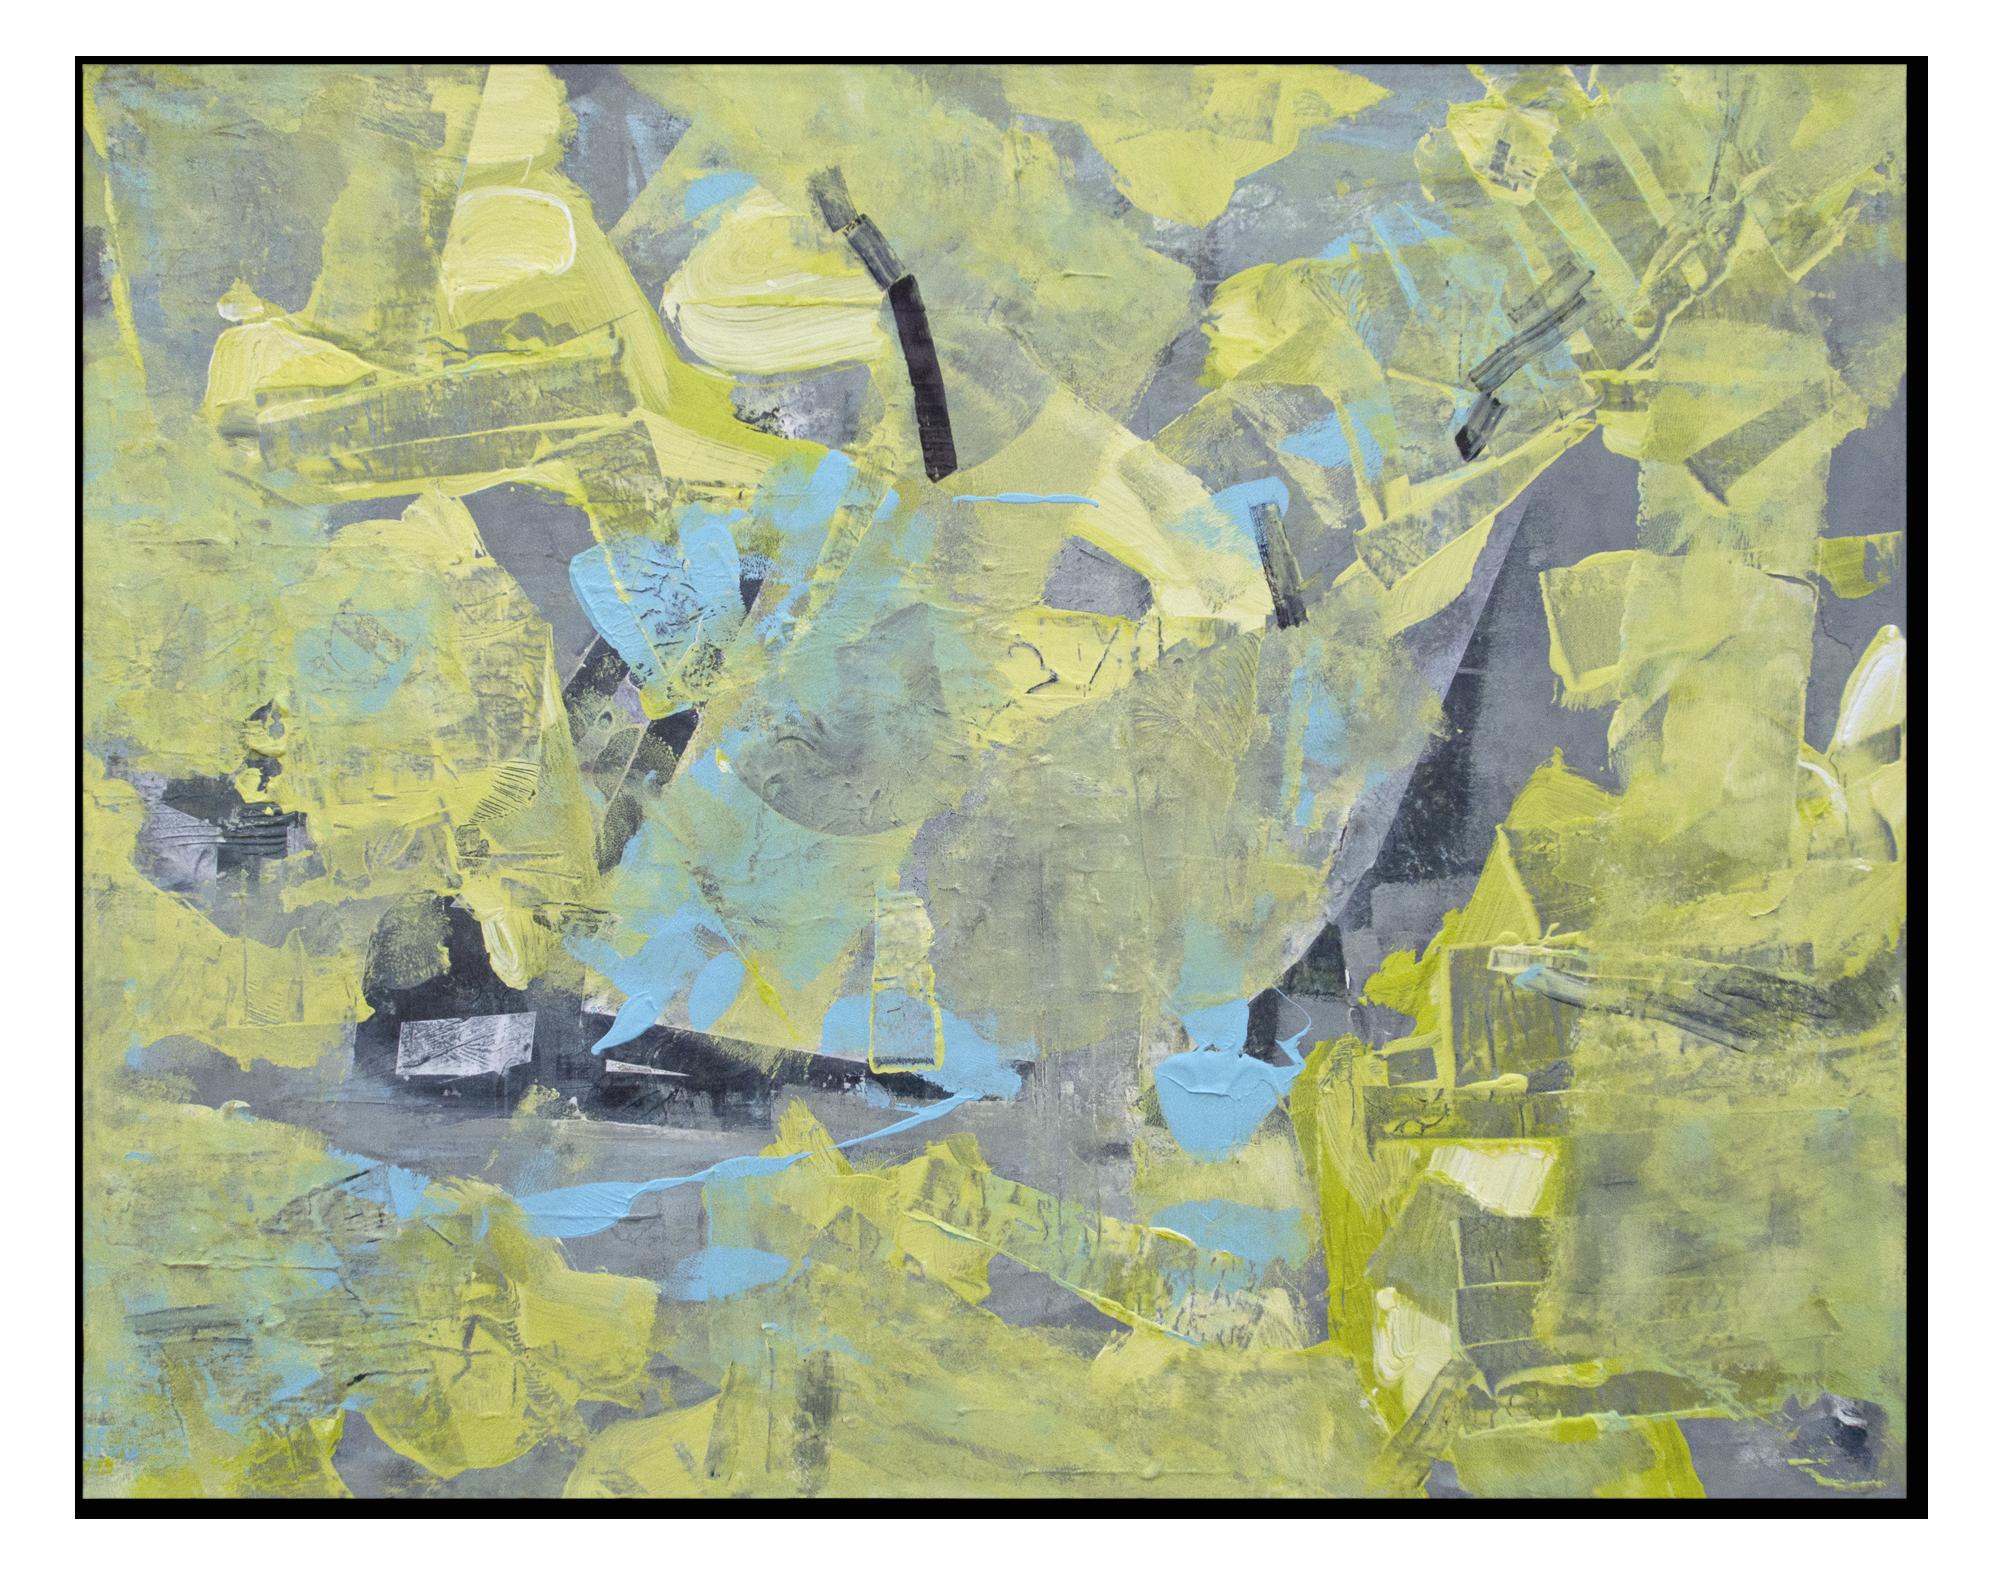 Feuilles volantes [100 x 80 cm] Acrylic on linen © Prosper Jerominus, 2015